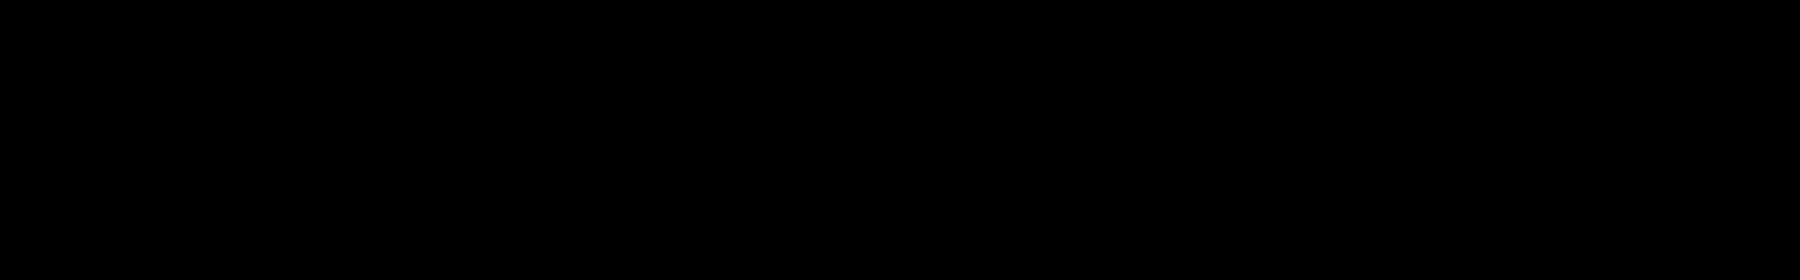 Plume Vol. 1 audio waveform